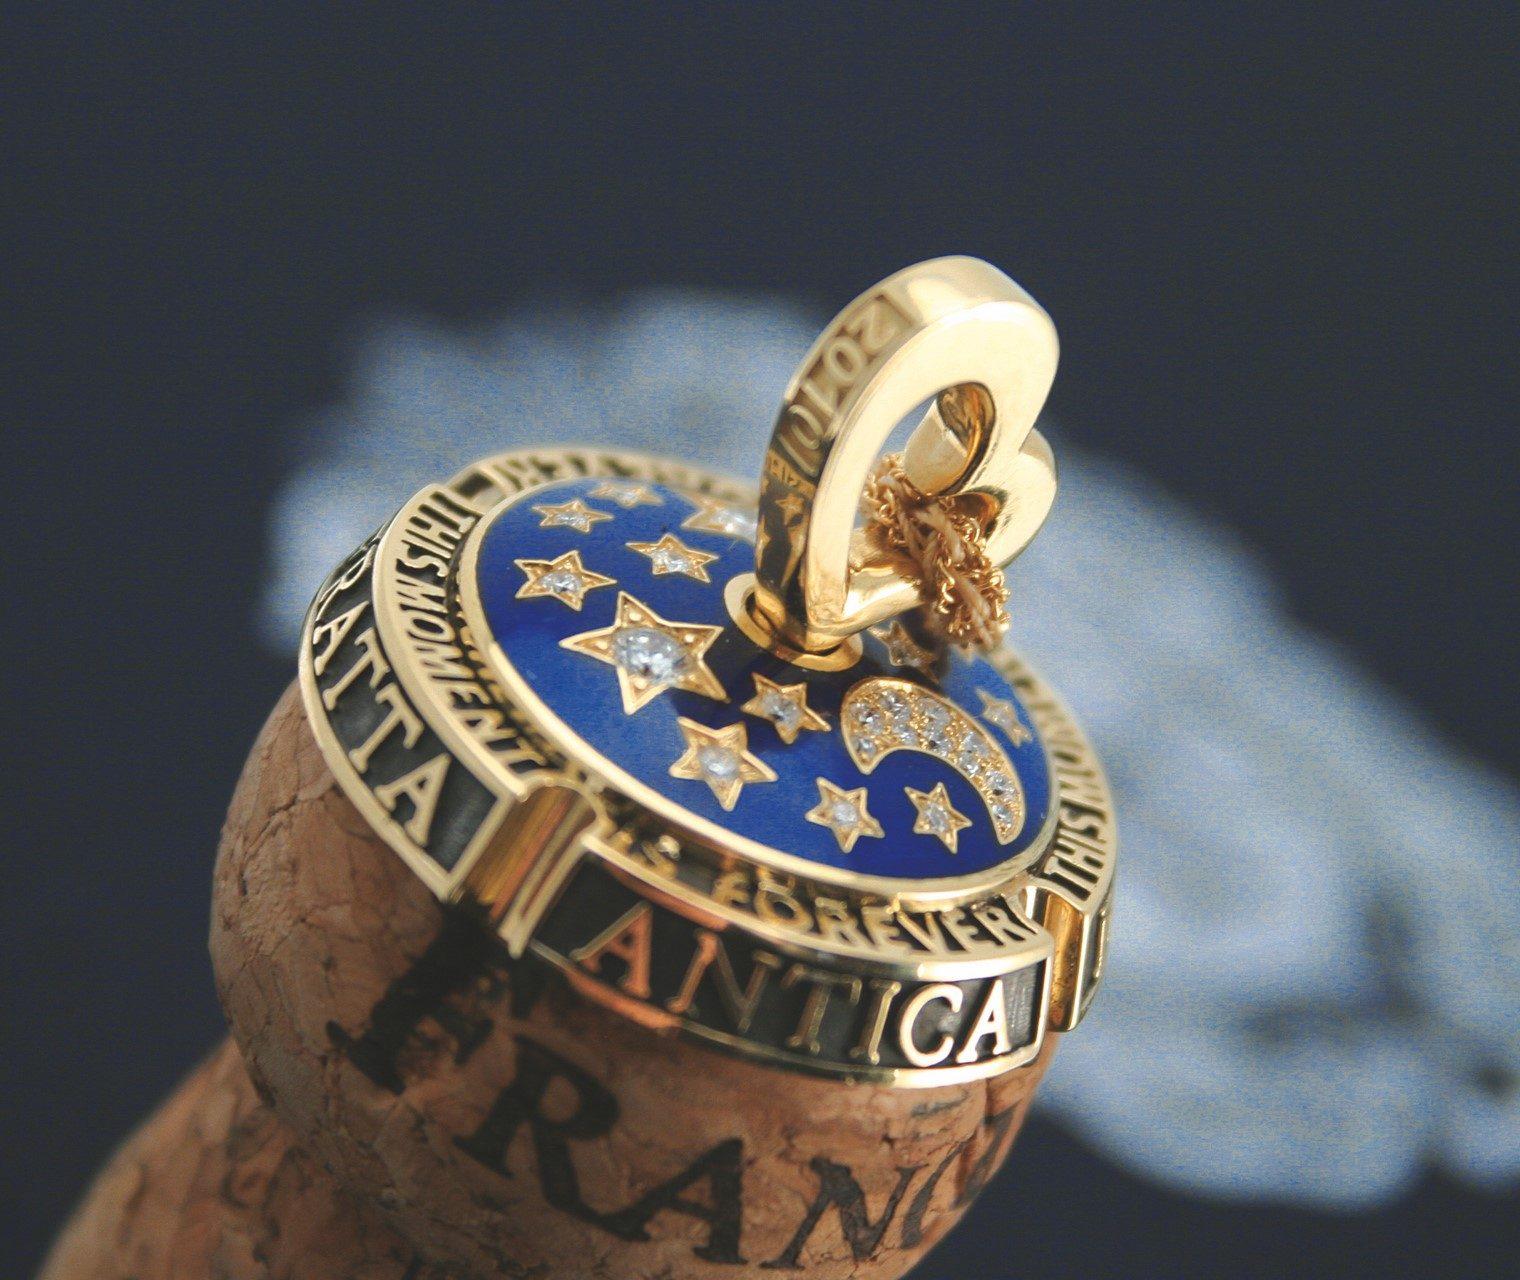 anticafratta019